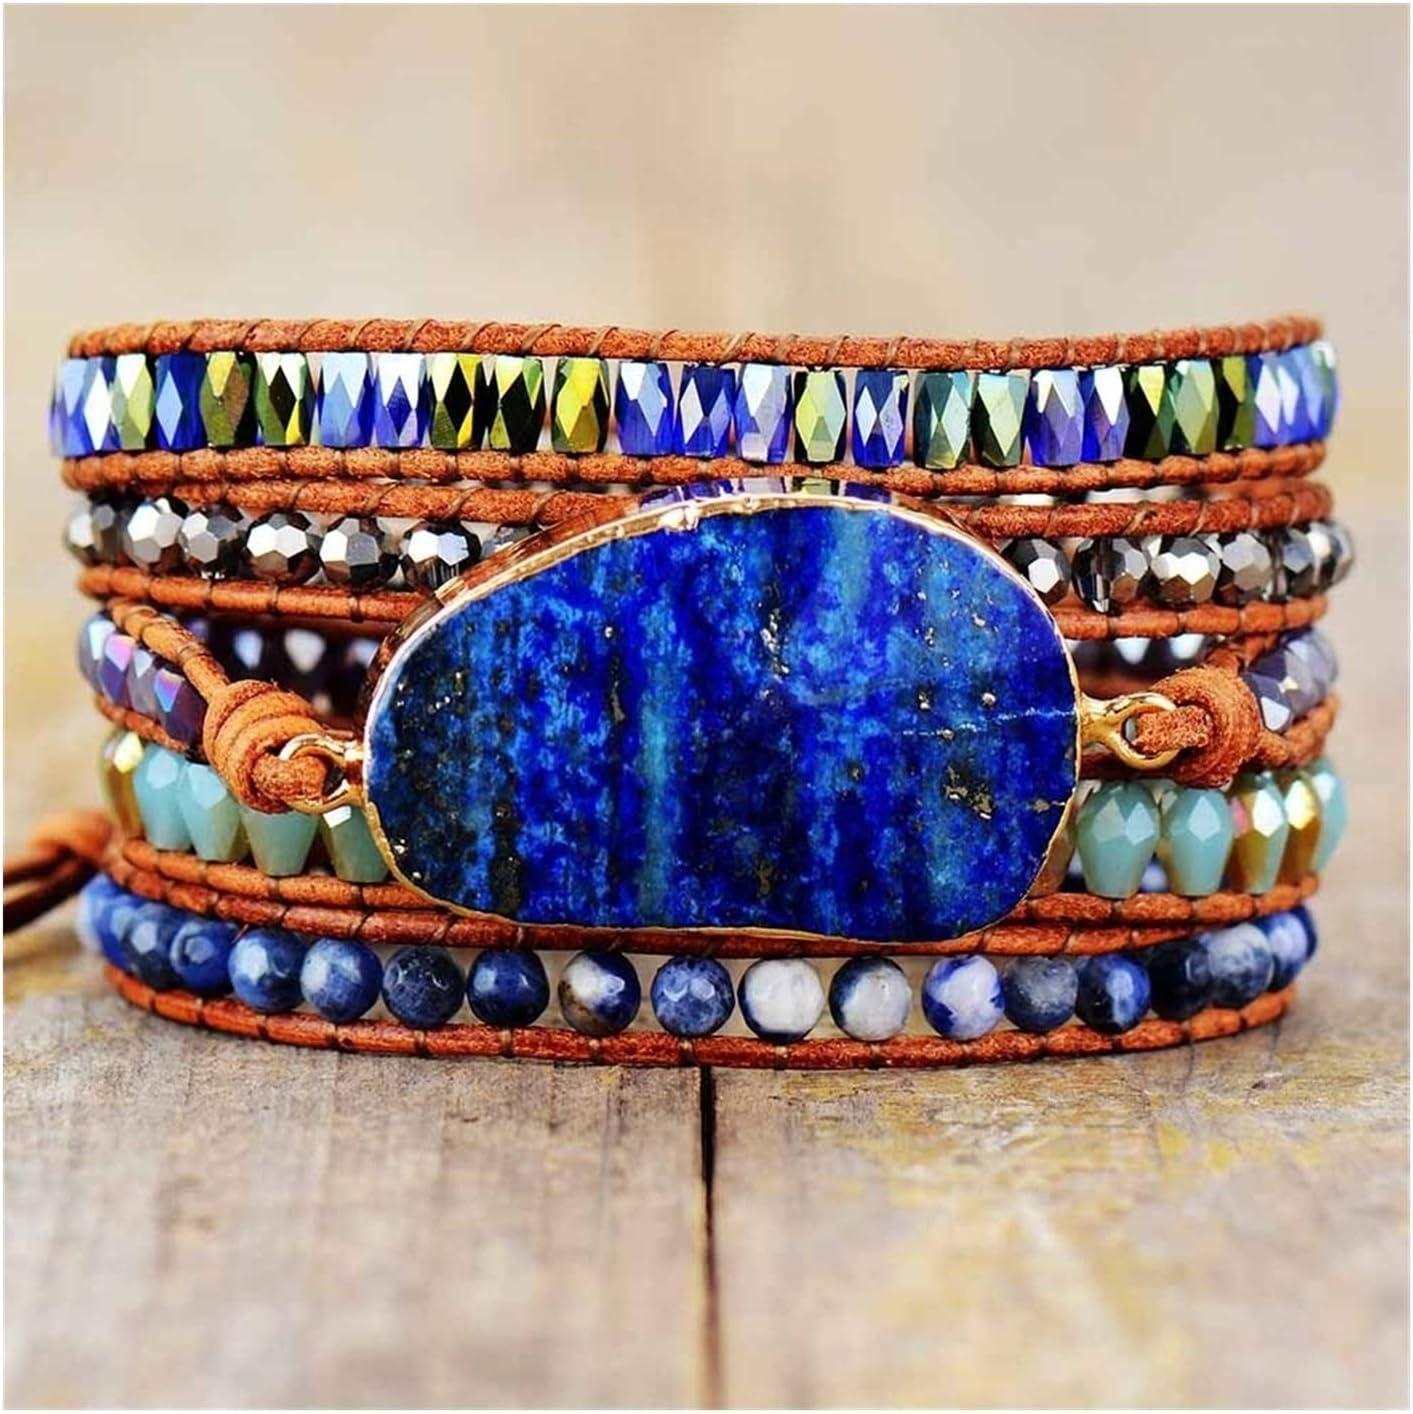 AOSUAI Wrap Bracelets with Phoenix Mall Natural Stones Lazuli Philadelphia Mall S Lapis Leather